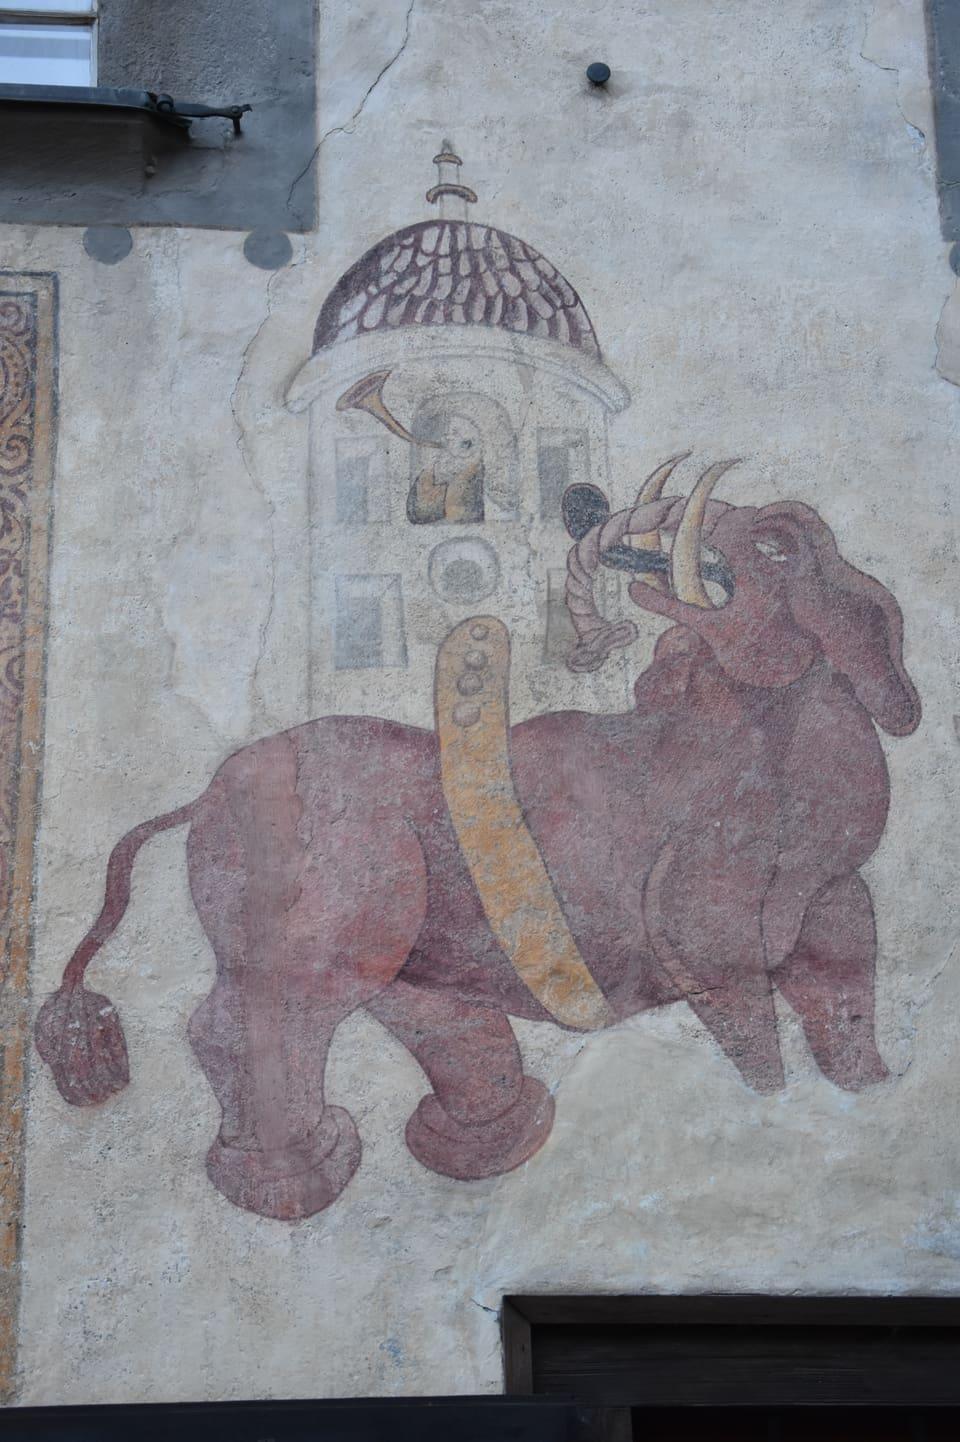 Maletg d'in elefant cotschen sin ina chasa a Giuvaulta.